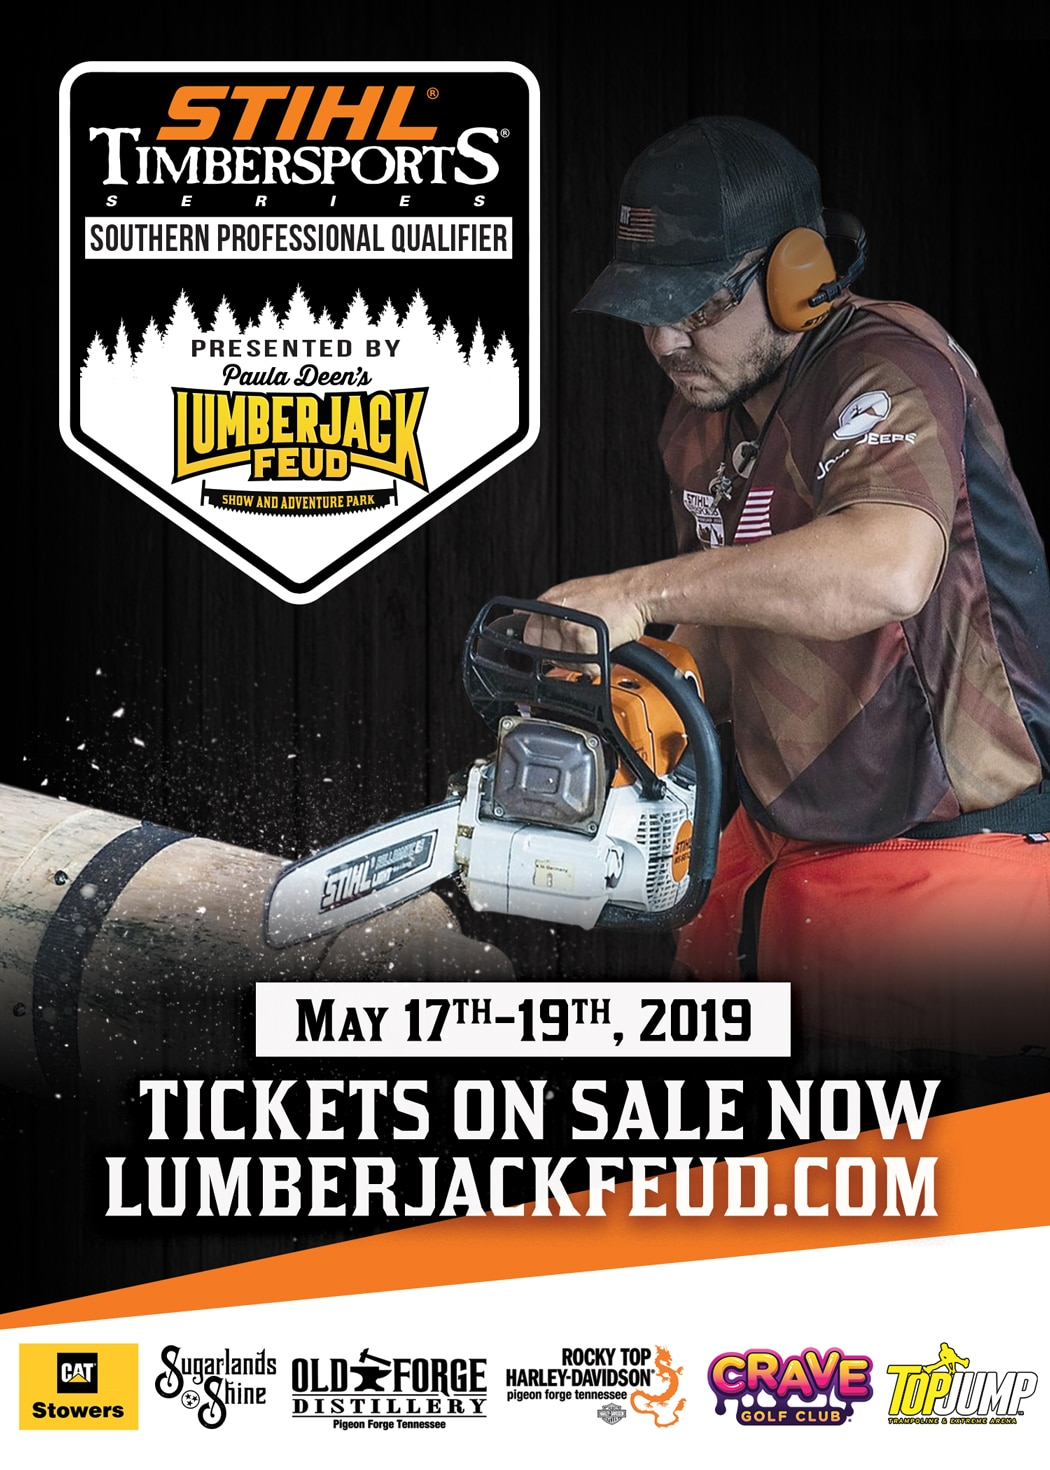 Stihl Timbersports Lumberjack Feud flyer